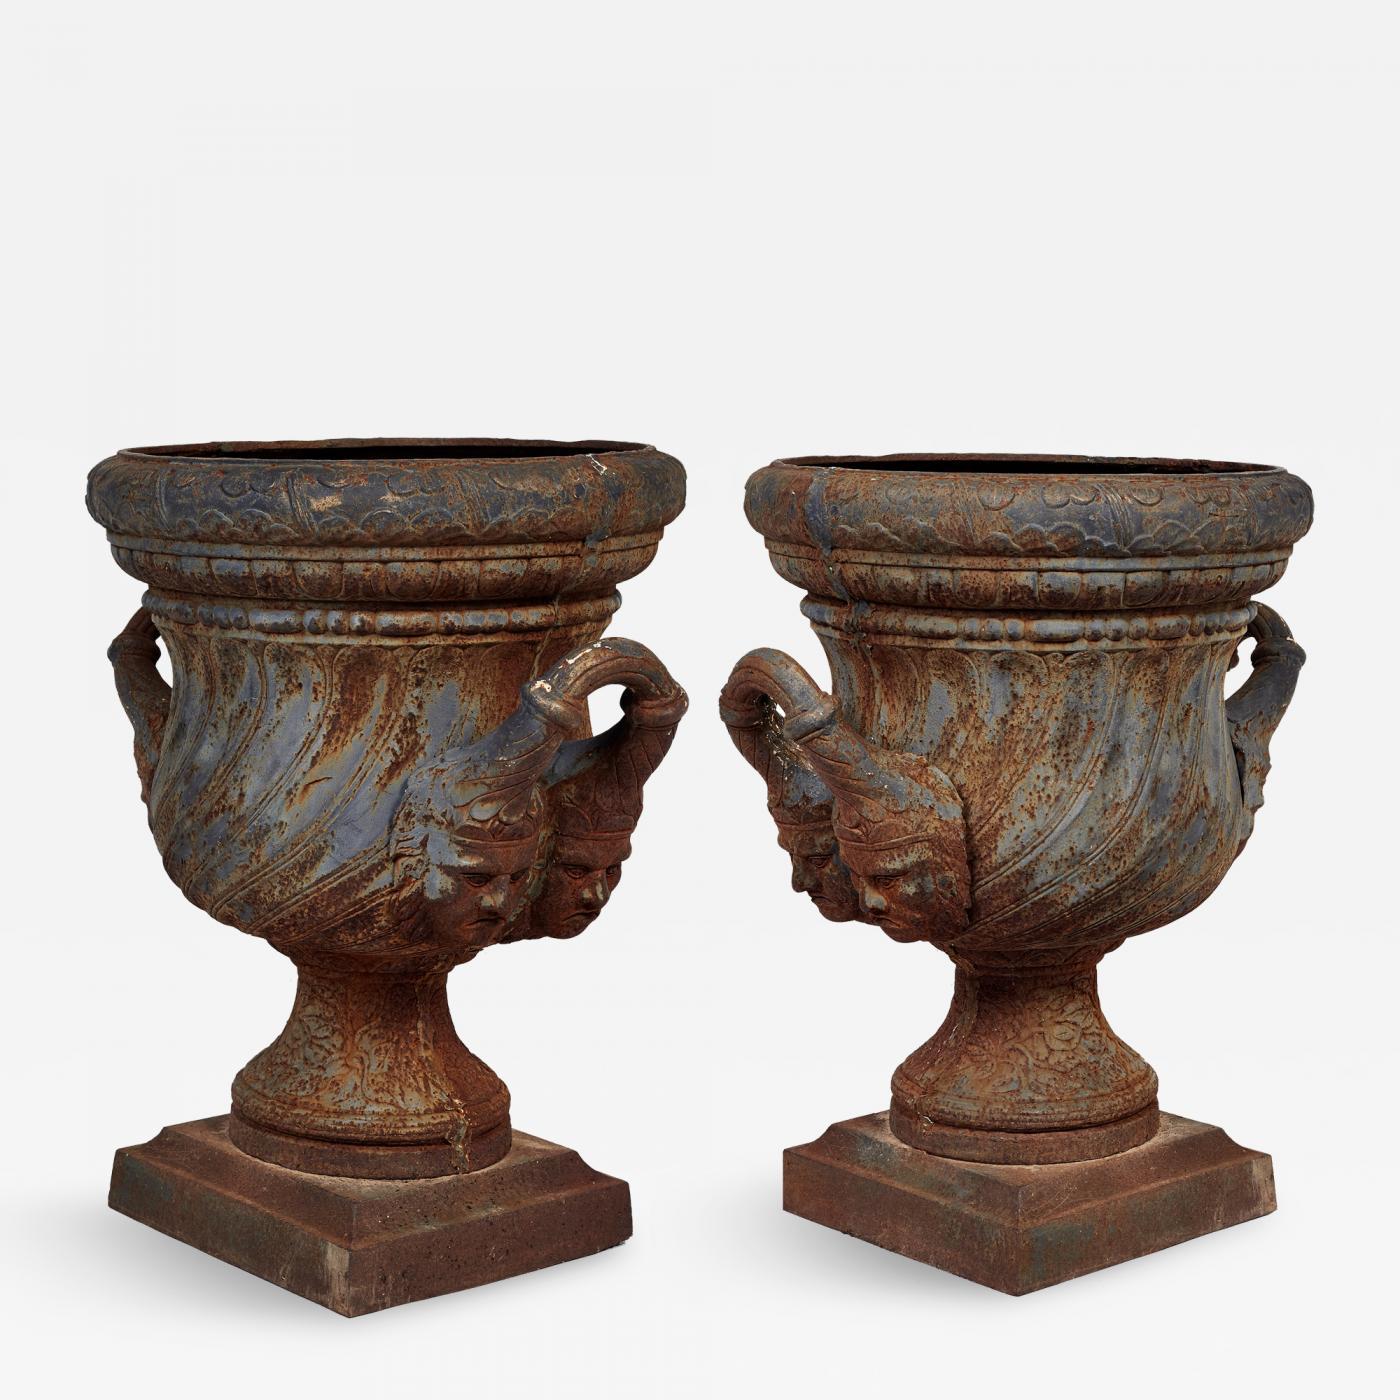 Attirant Listings / Decorative Arts / Garden U0026 Architectural / Planters U0026  Jardinieres · 19th Century Pair Of Iron Garden Urns